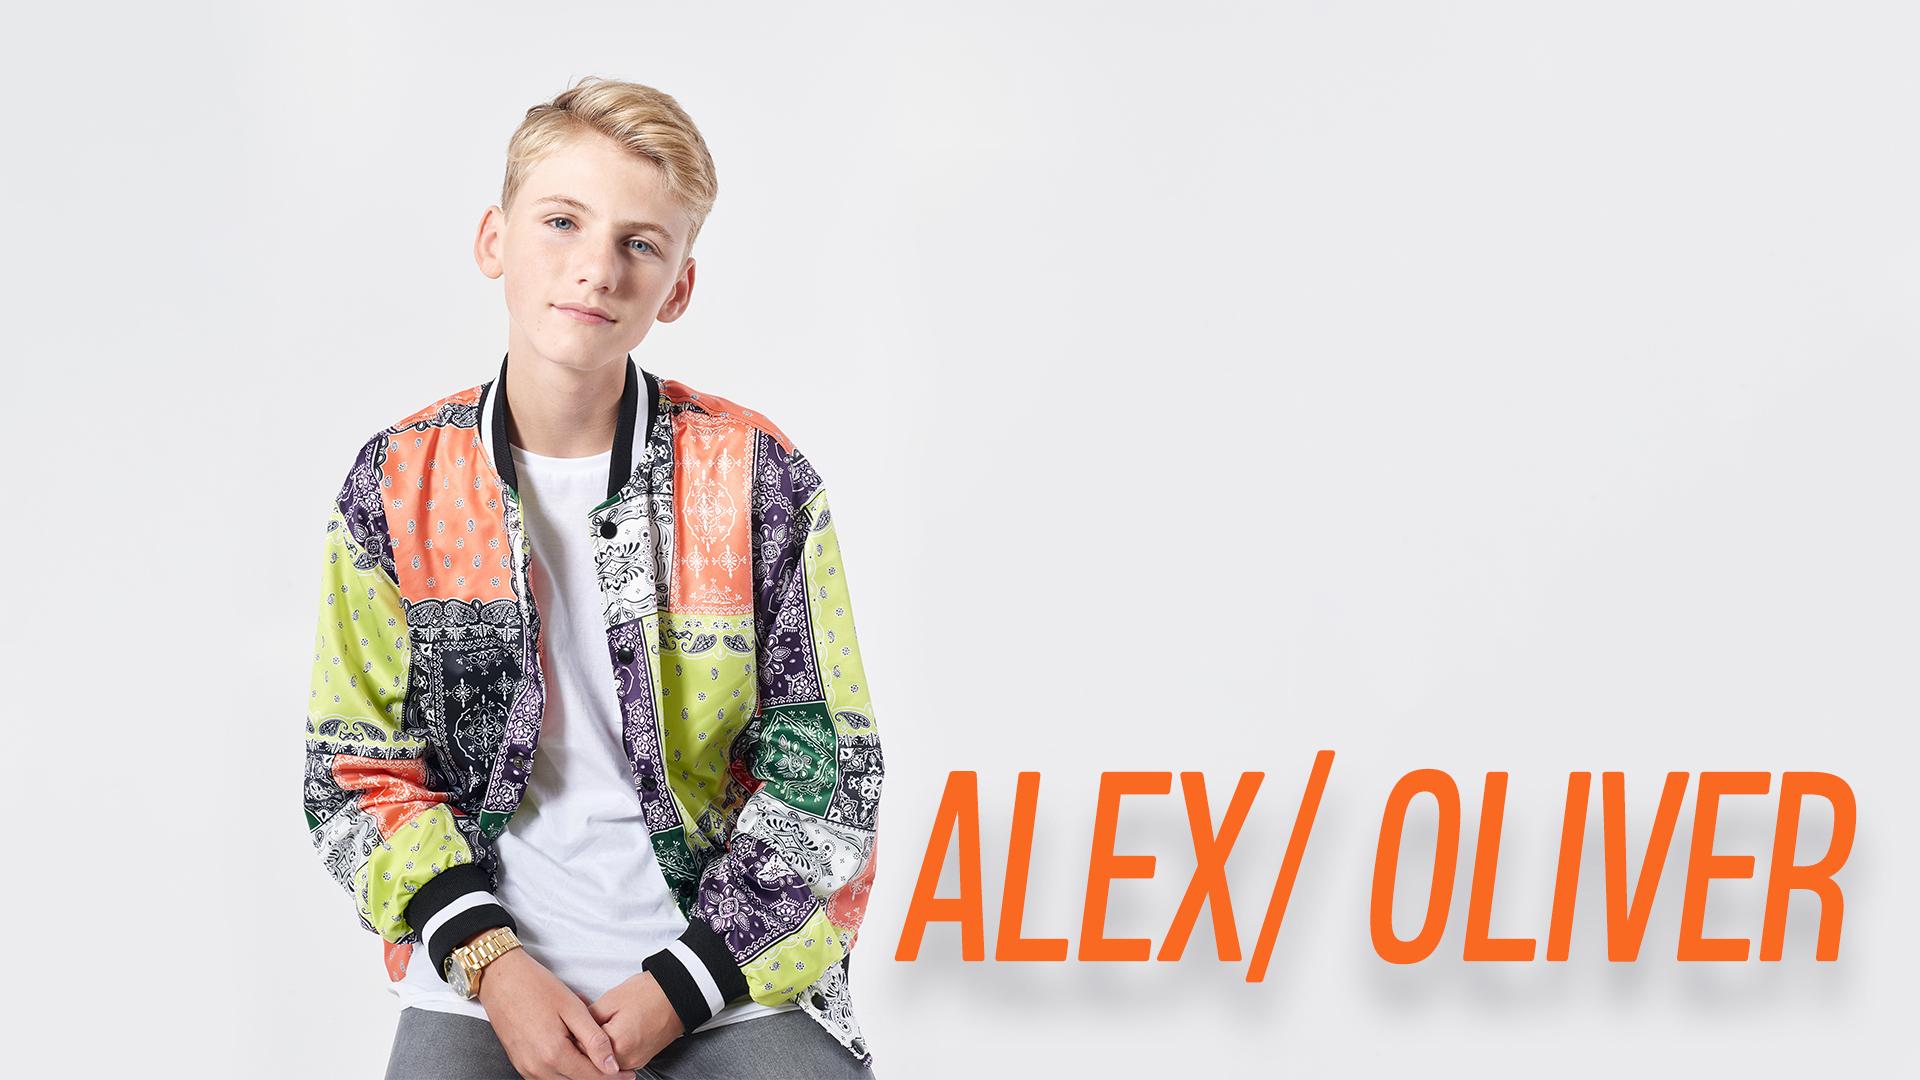 Alex i up4noise